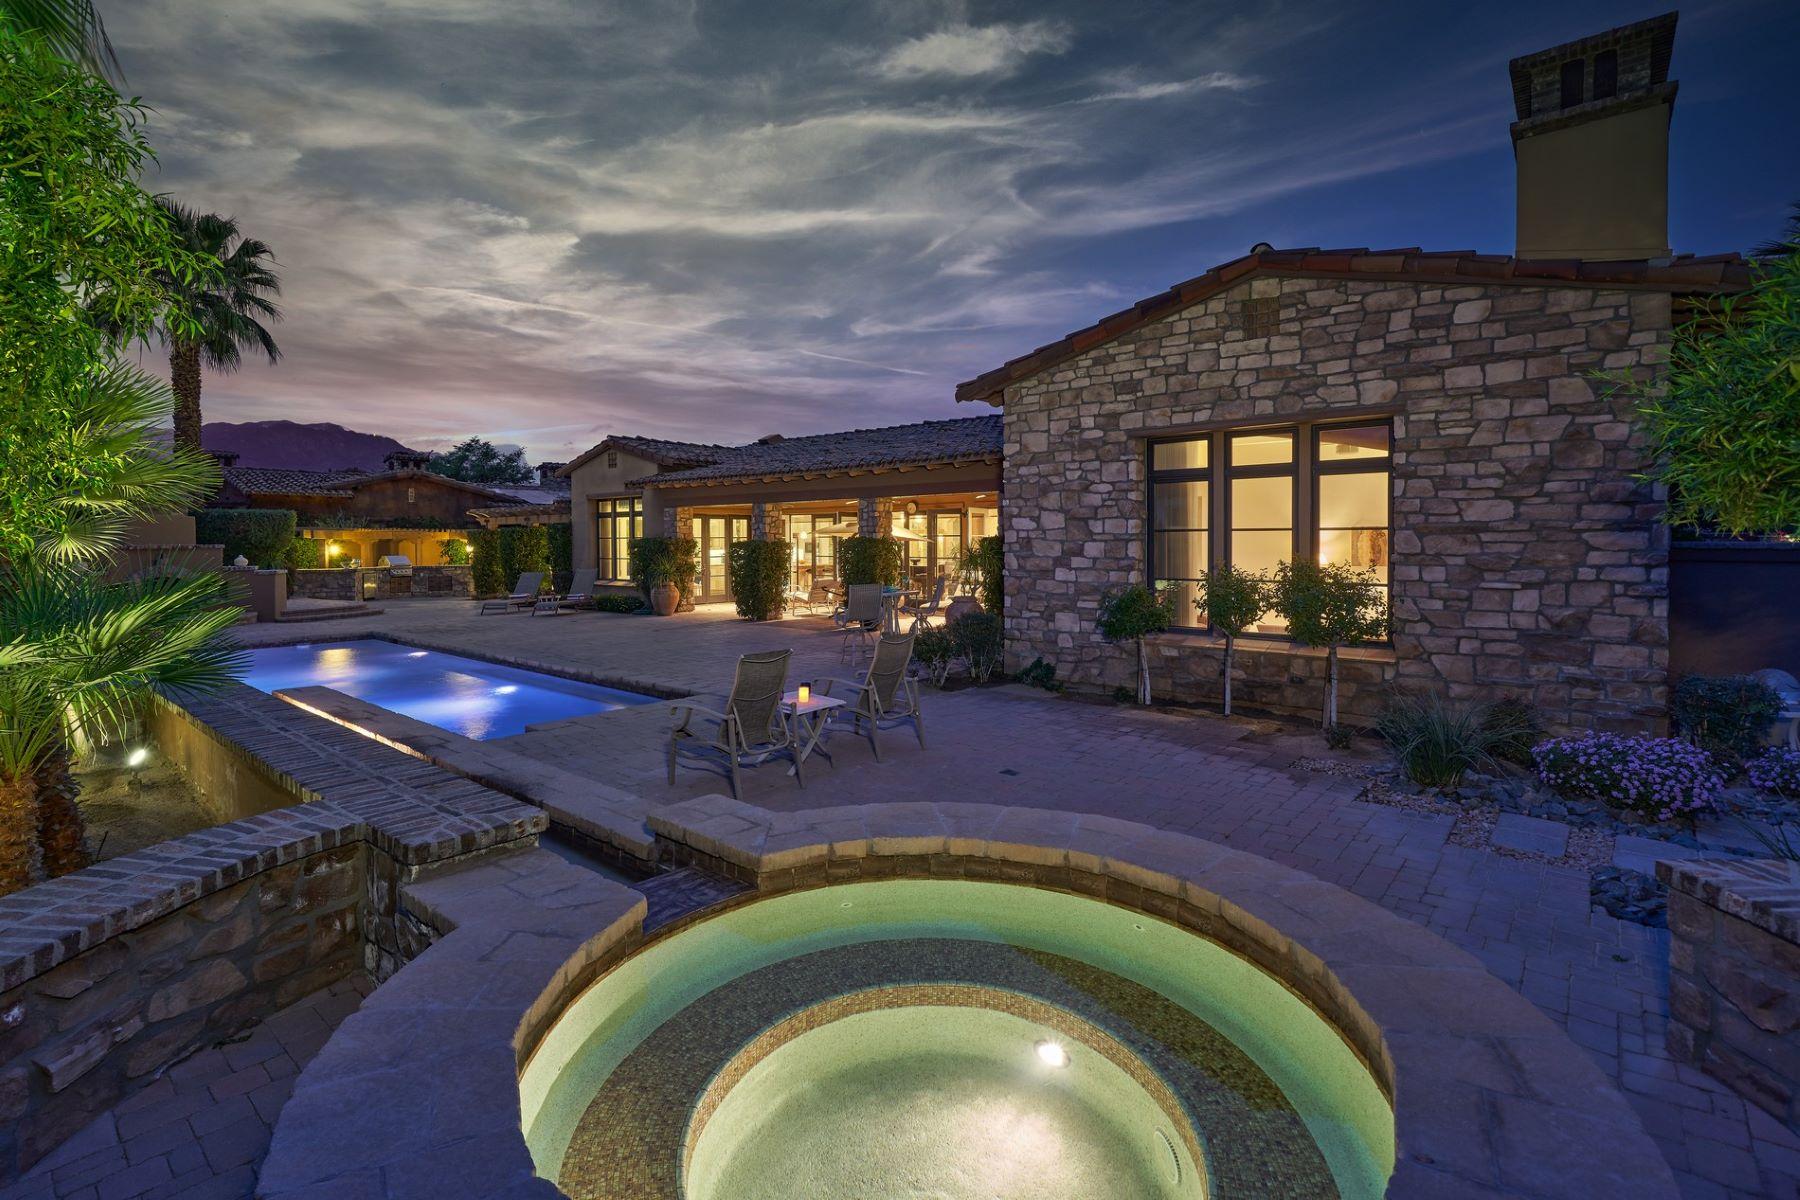 Single Family Homes for Sale at 9 Via Perugia Rancho Mirage, California 92270 United States